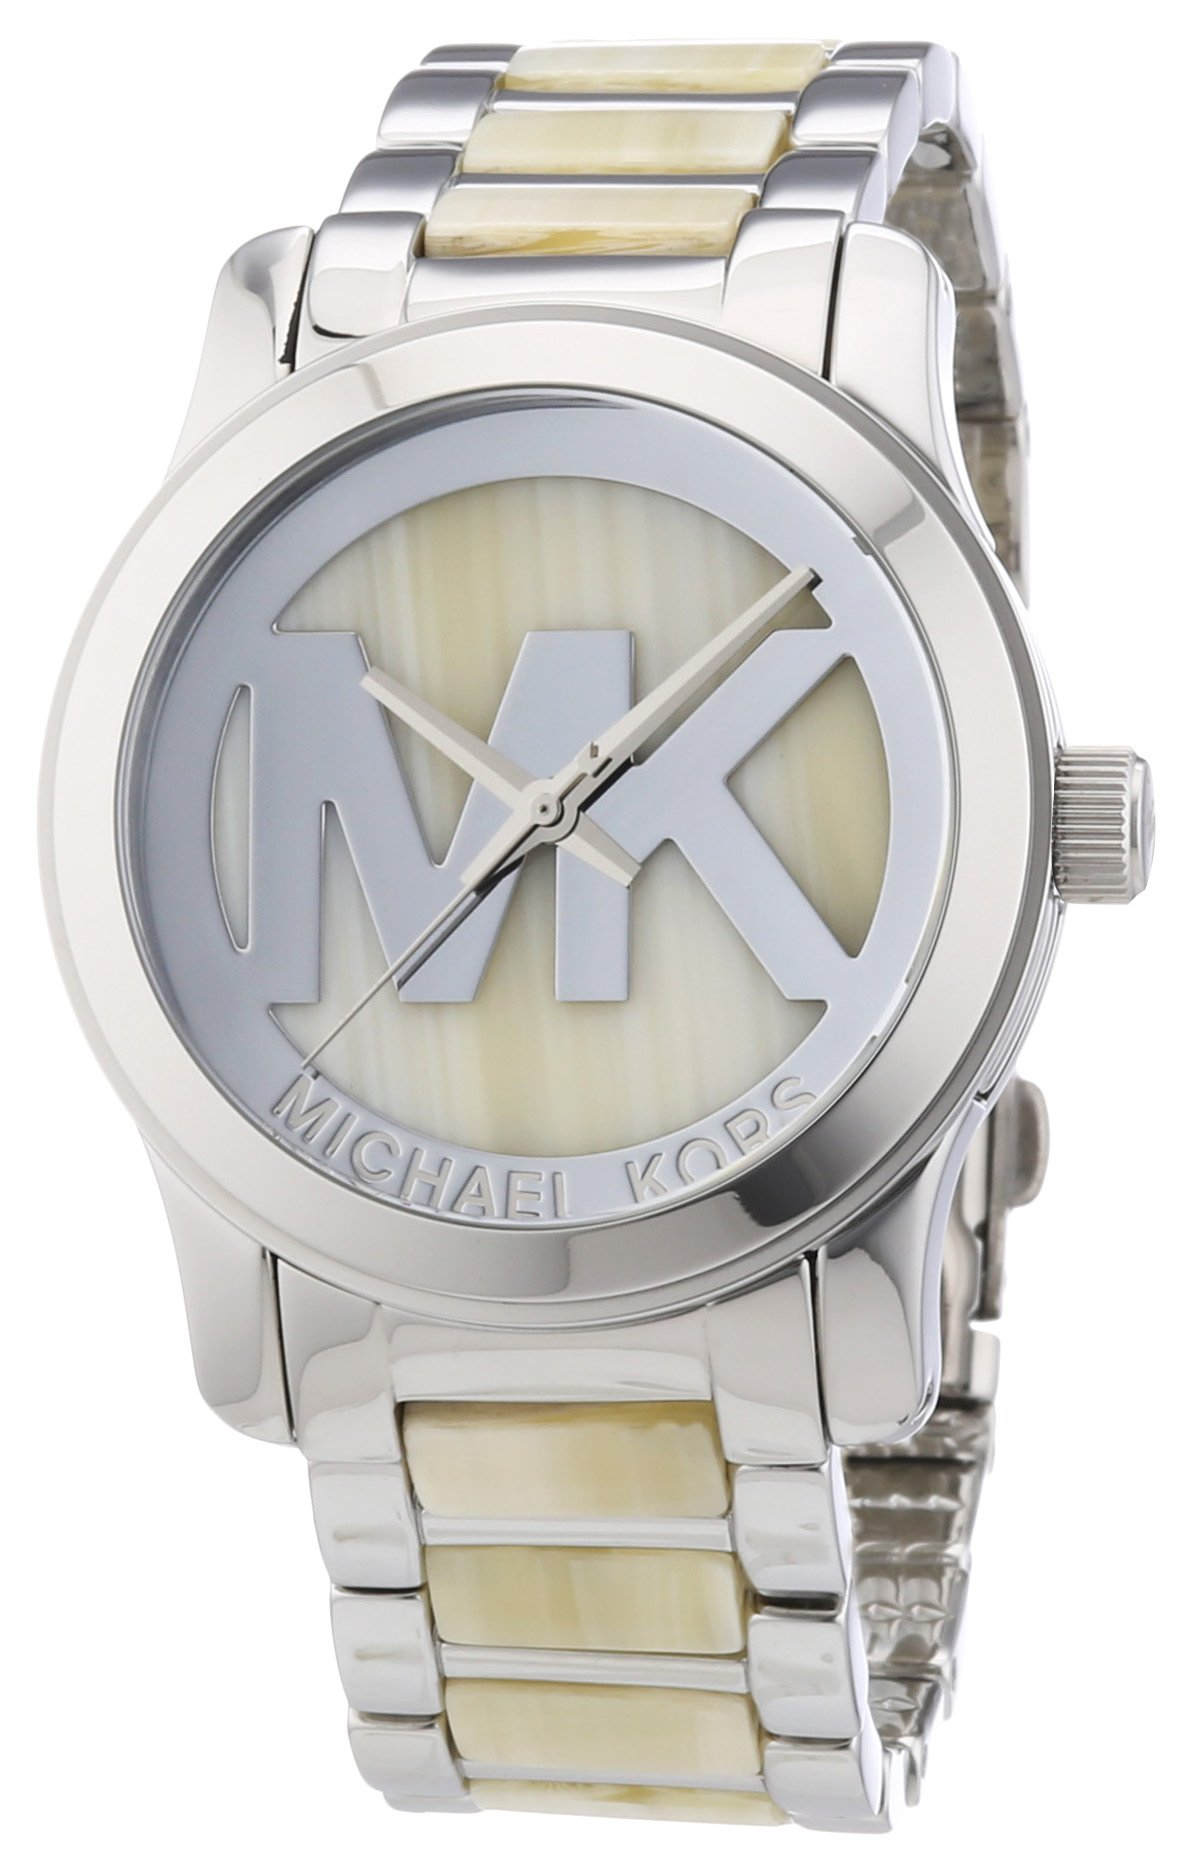 Michael Kors MK5787 Women's Watch